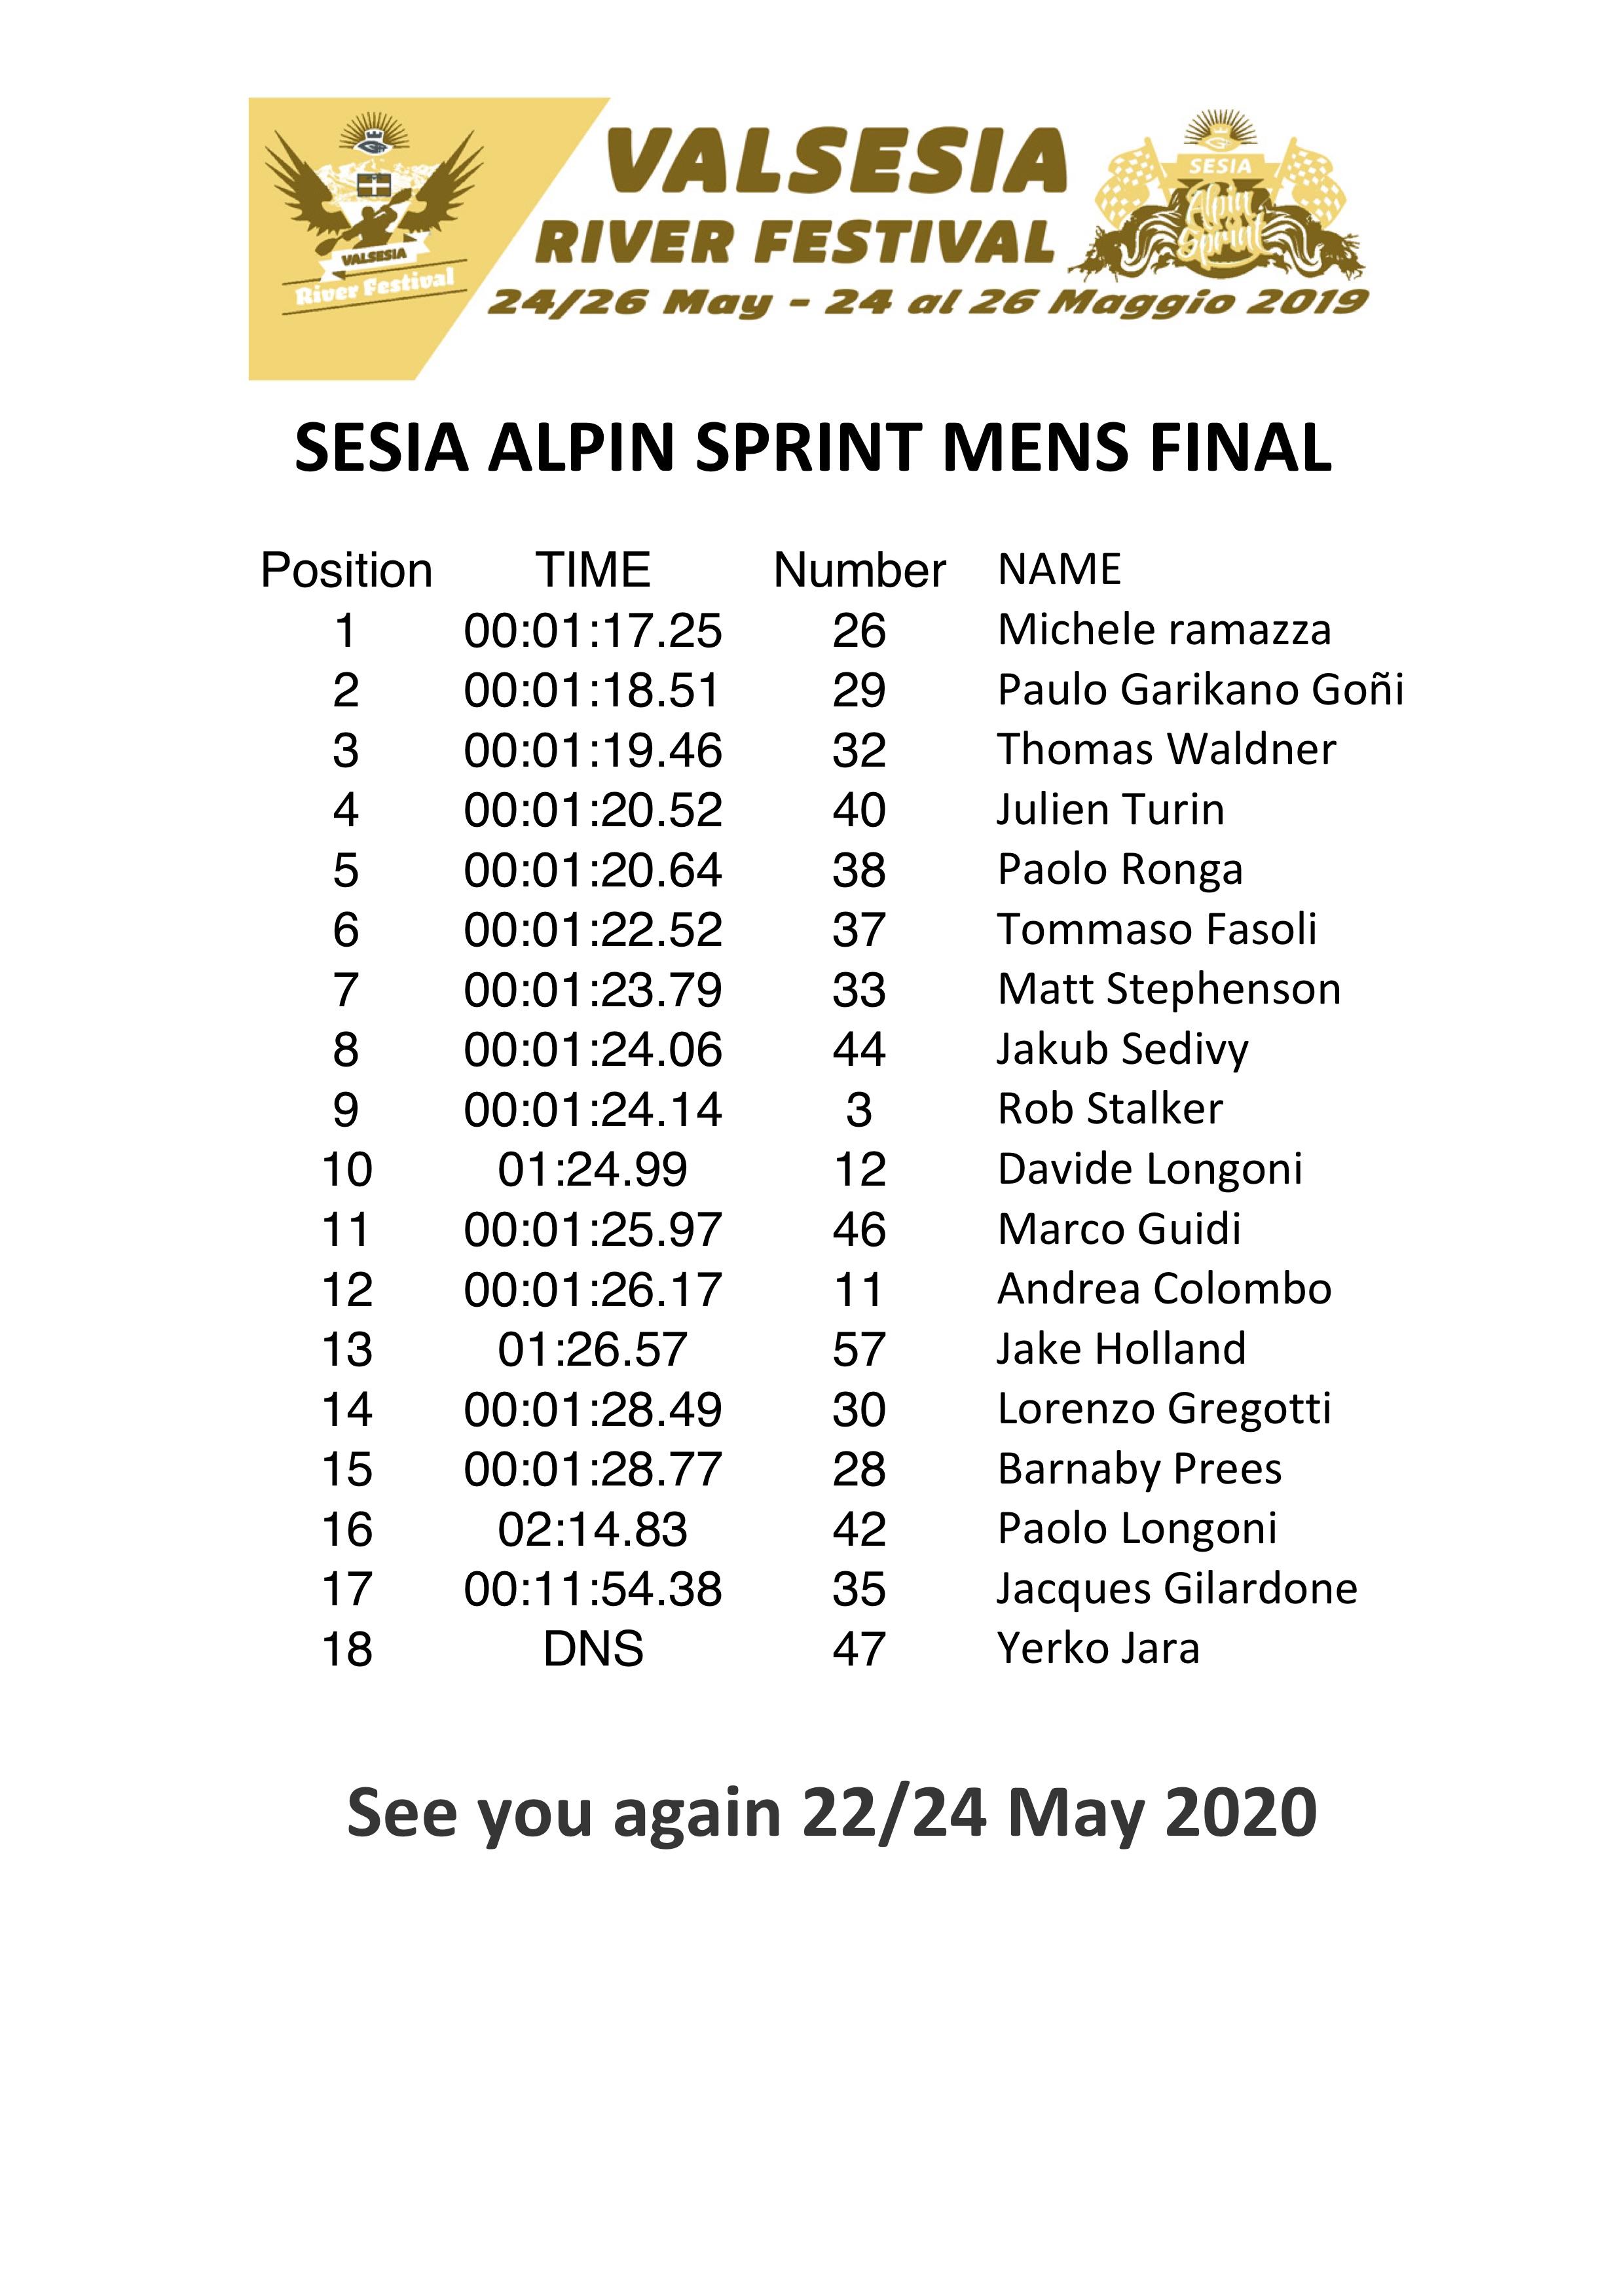 SAS 2019 Mensa FINAL